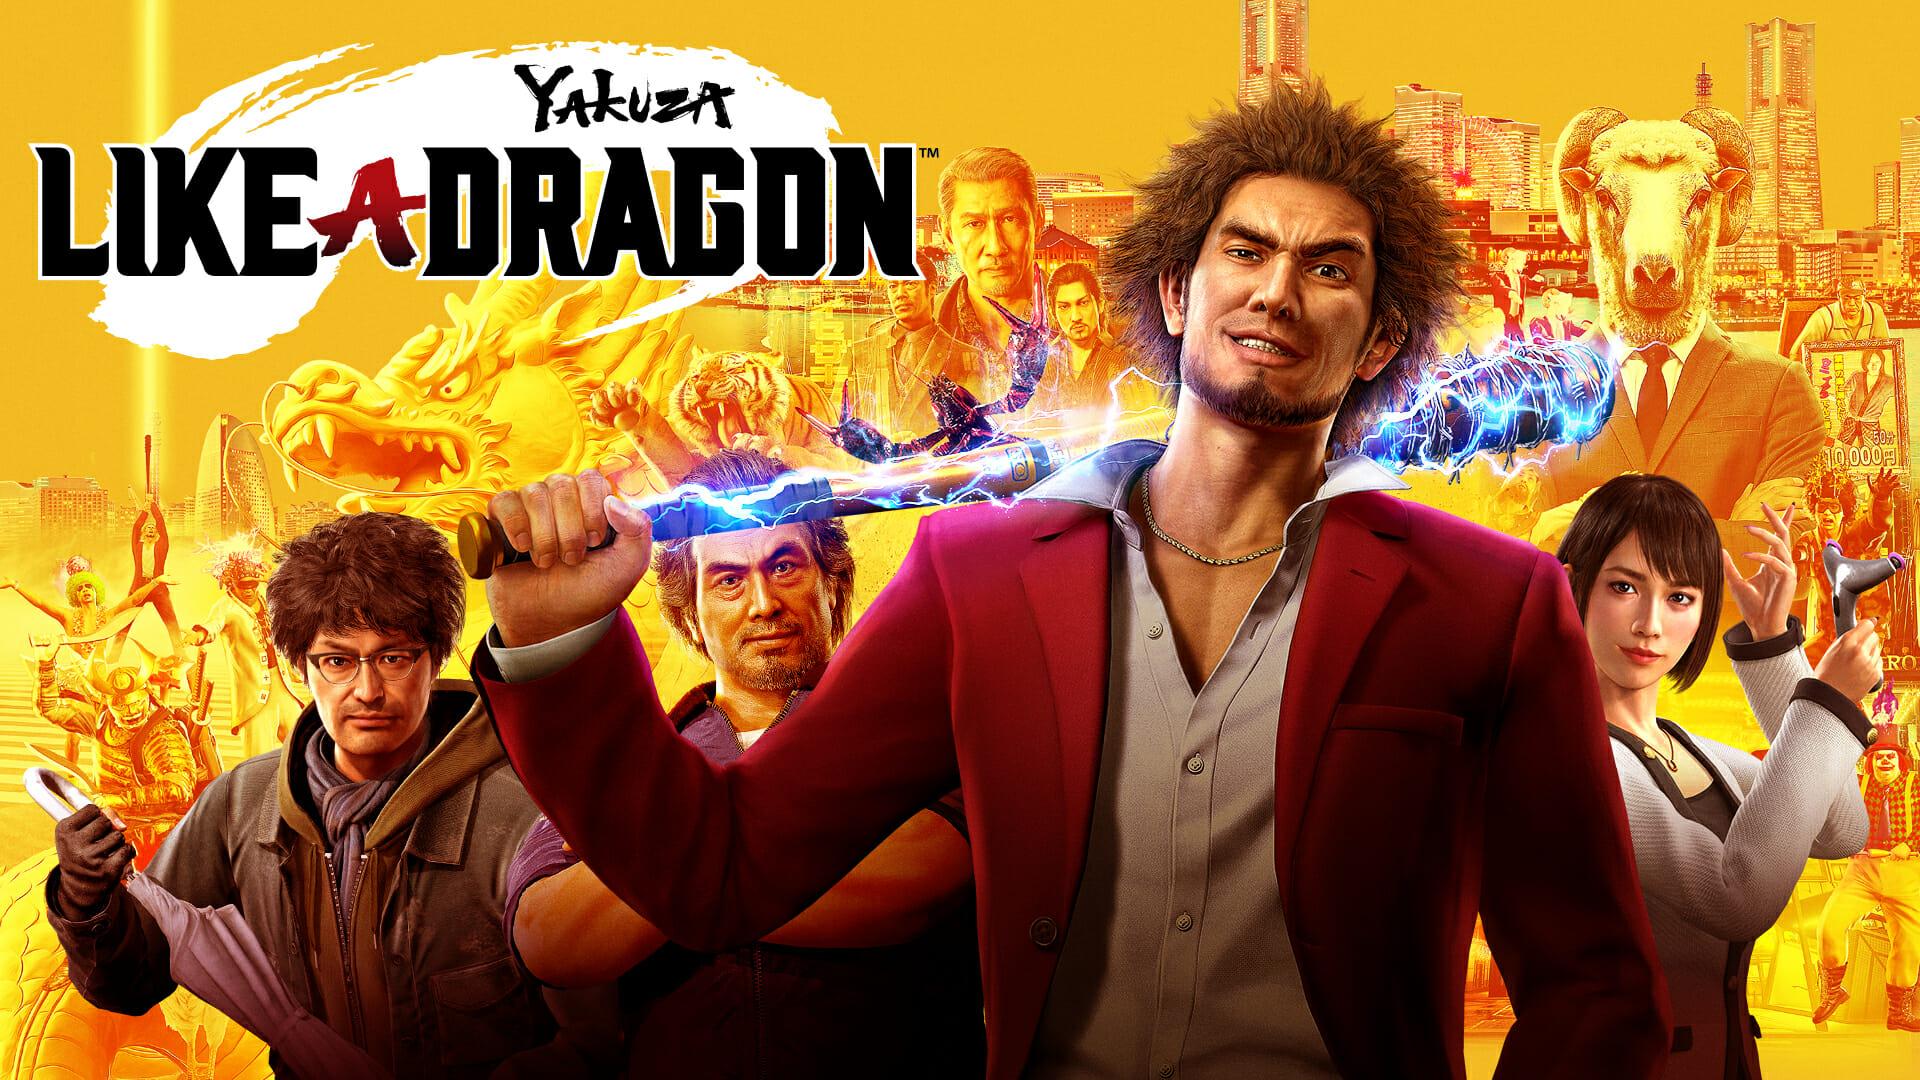 Yakuza like a dragon controller issue